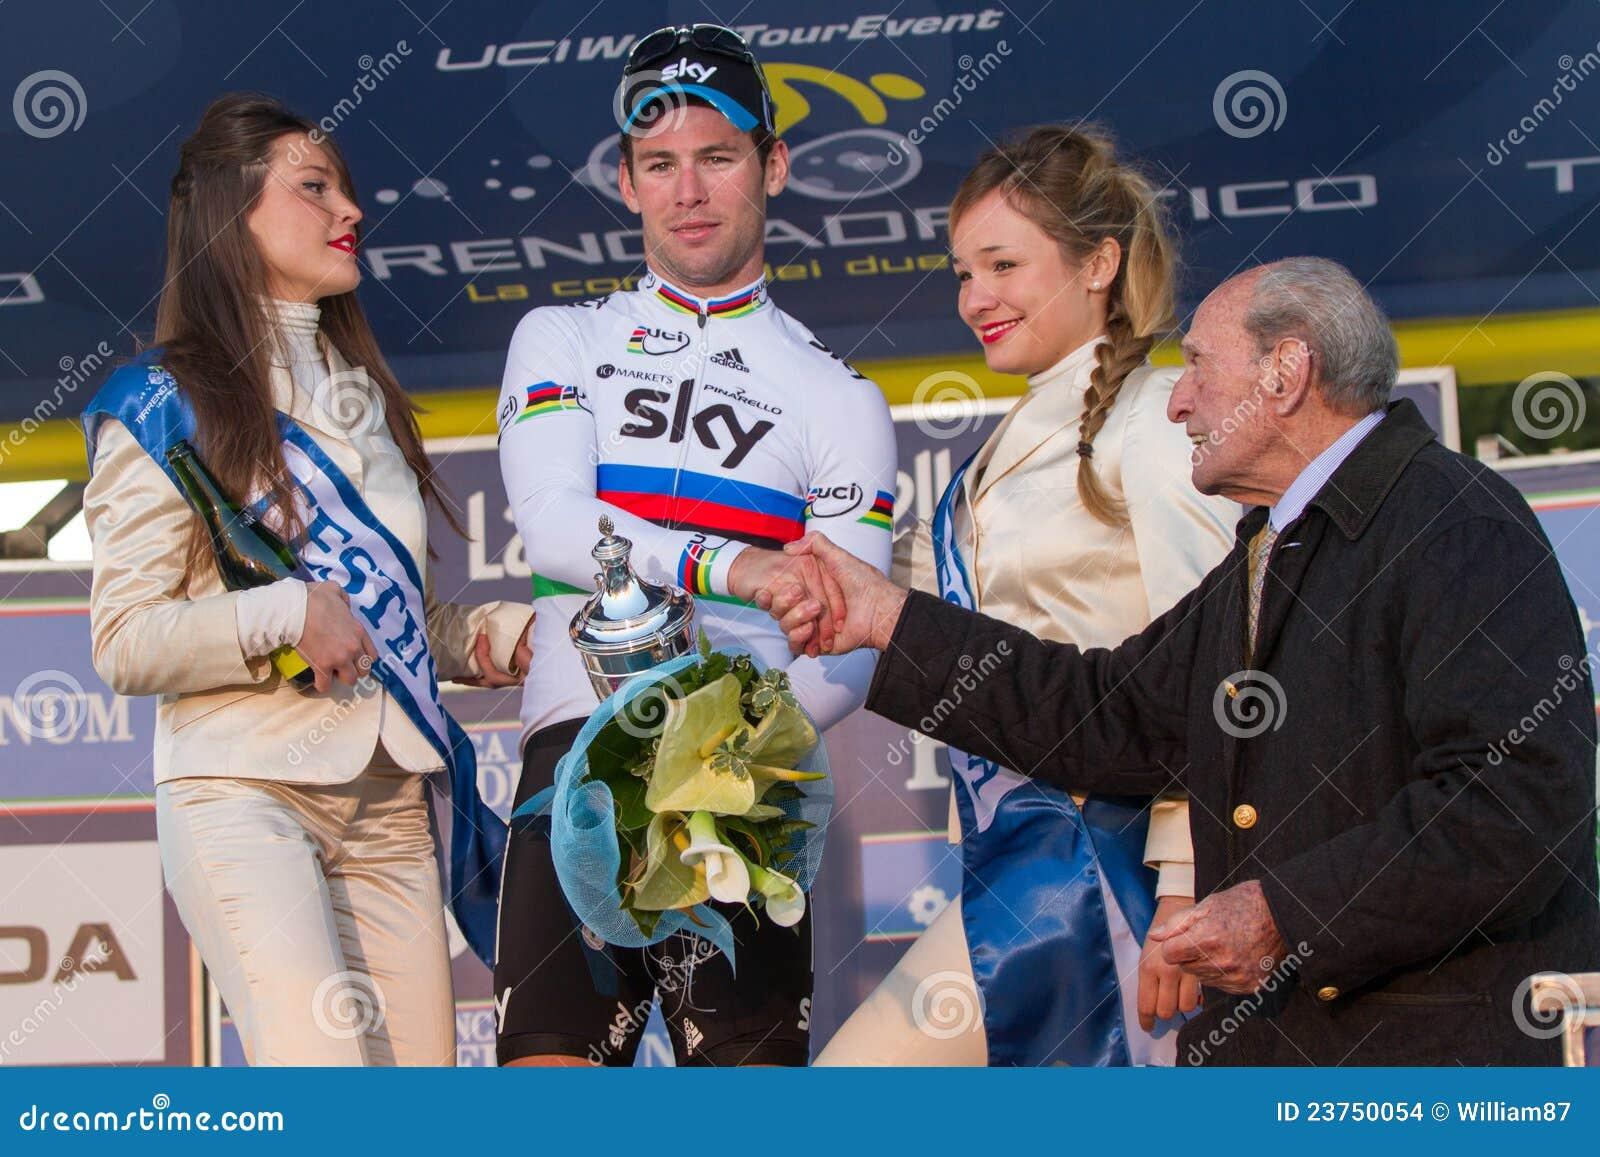 Tirreno Adriatico 2012, zweite Etappe